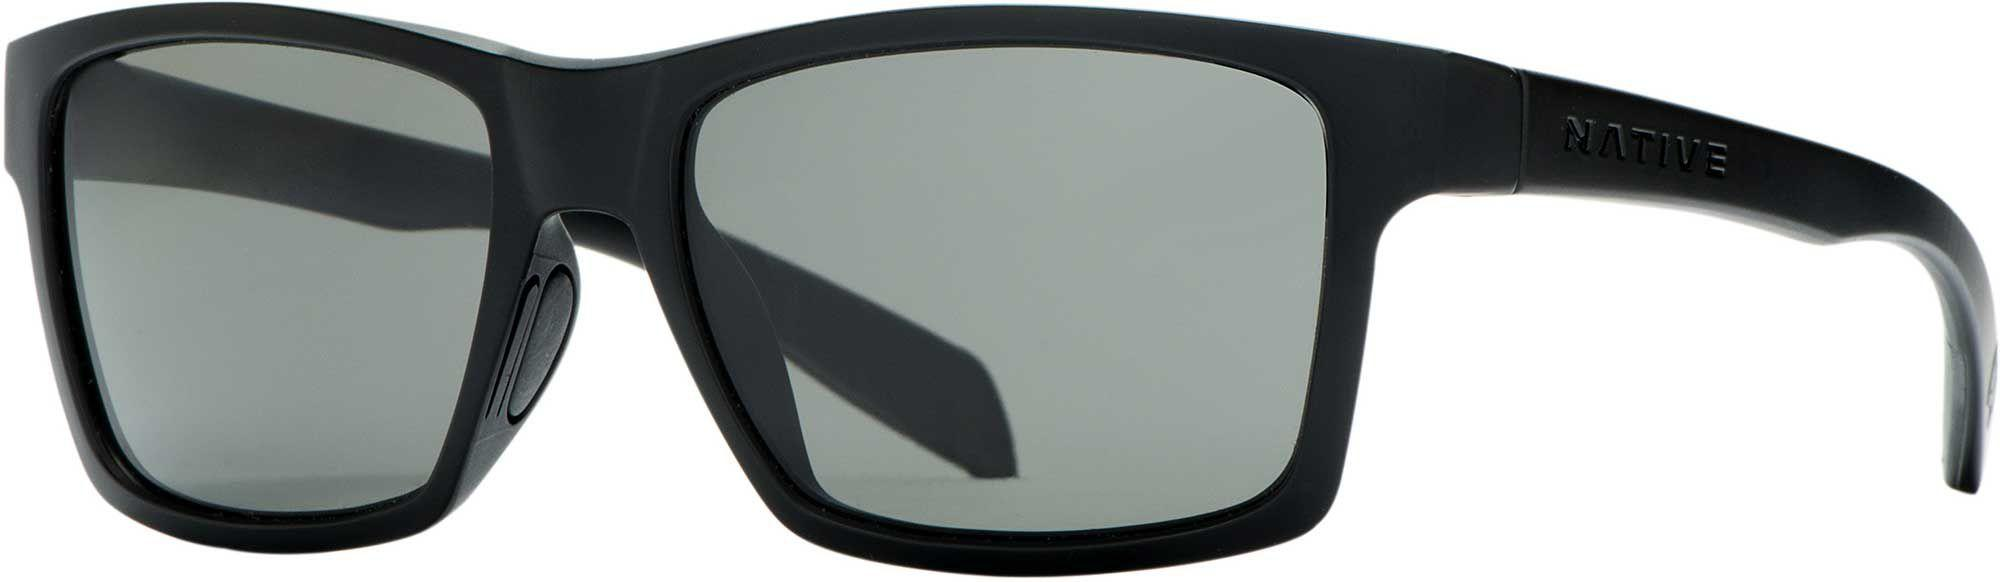 935b10acef Lyst - Native Eyewear Flatirons Sunglasses in Black